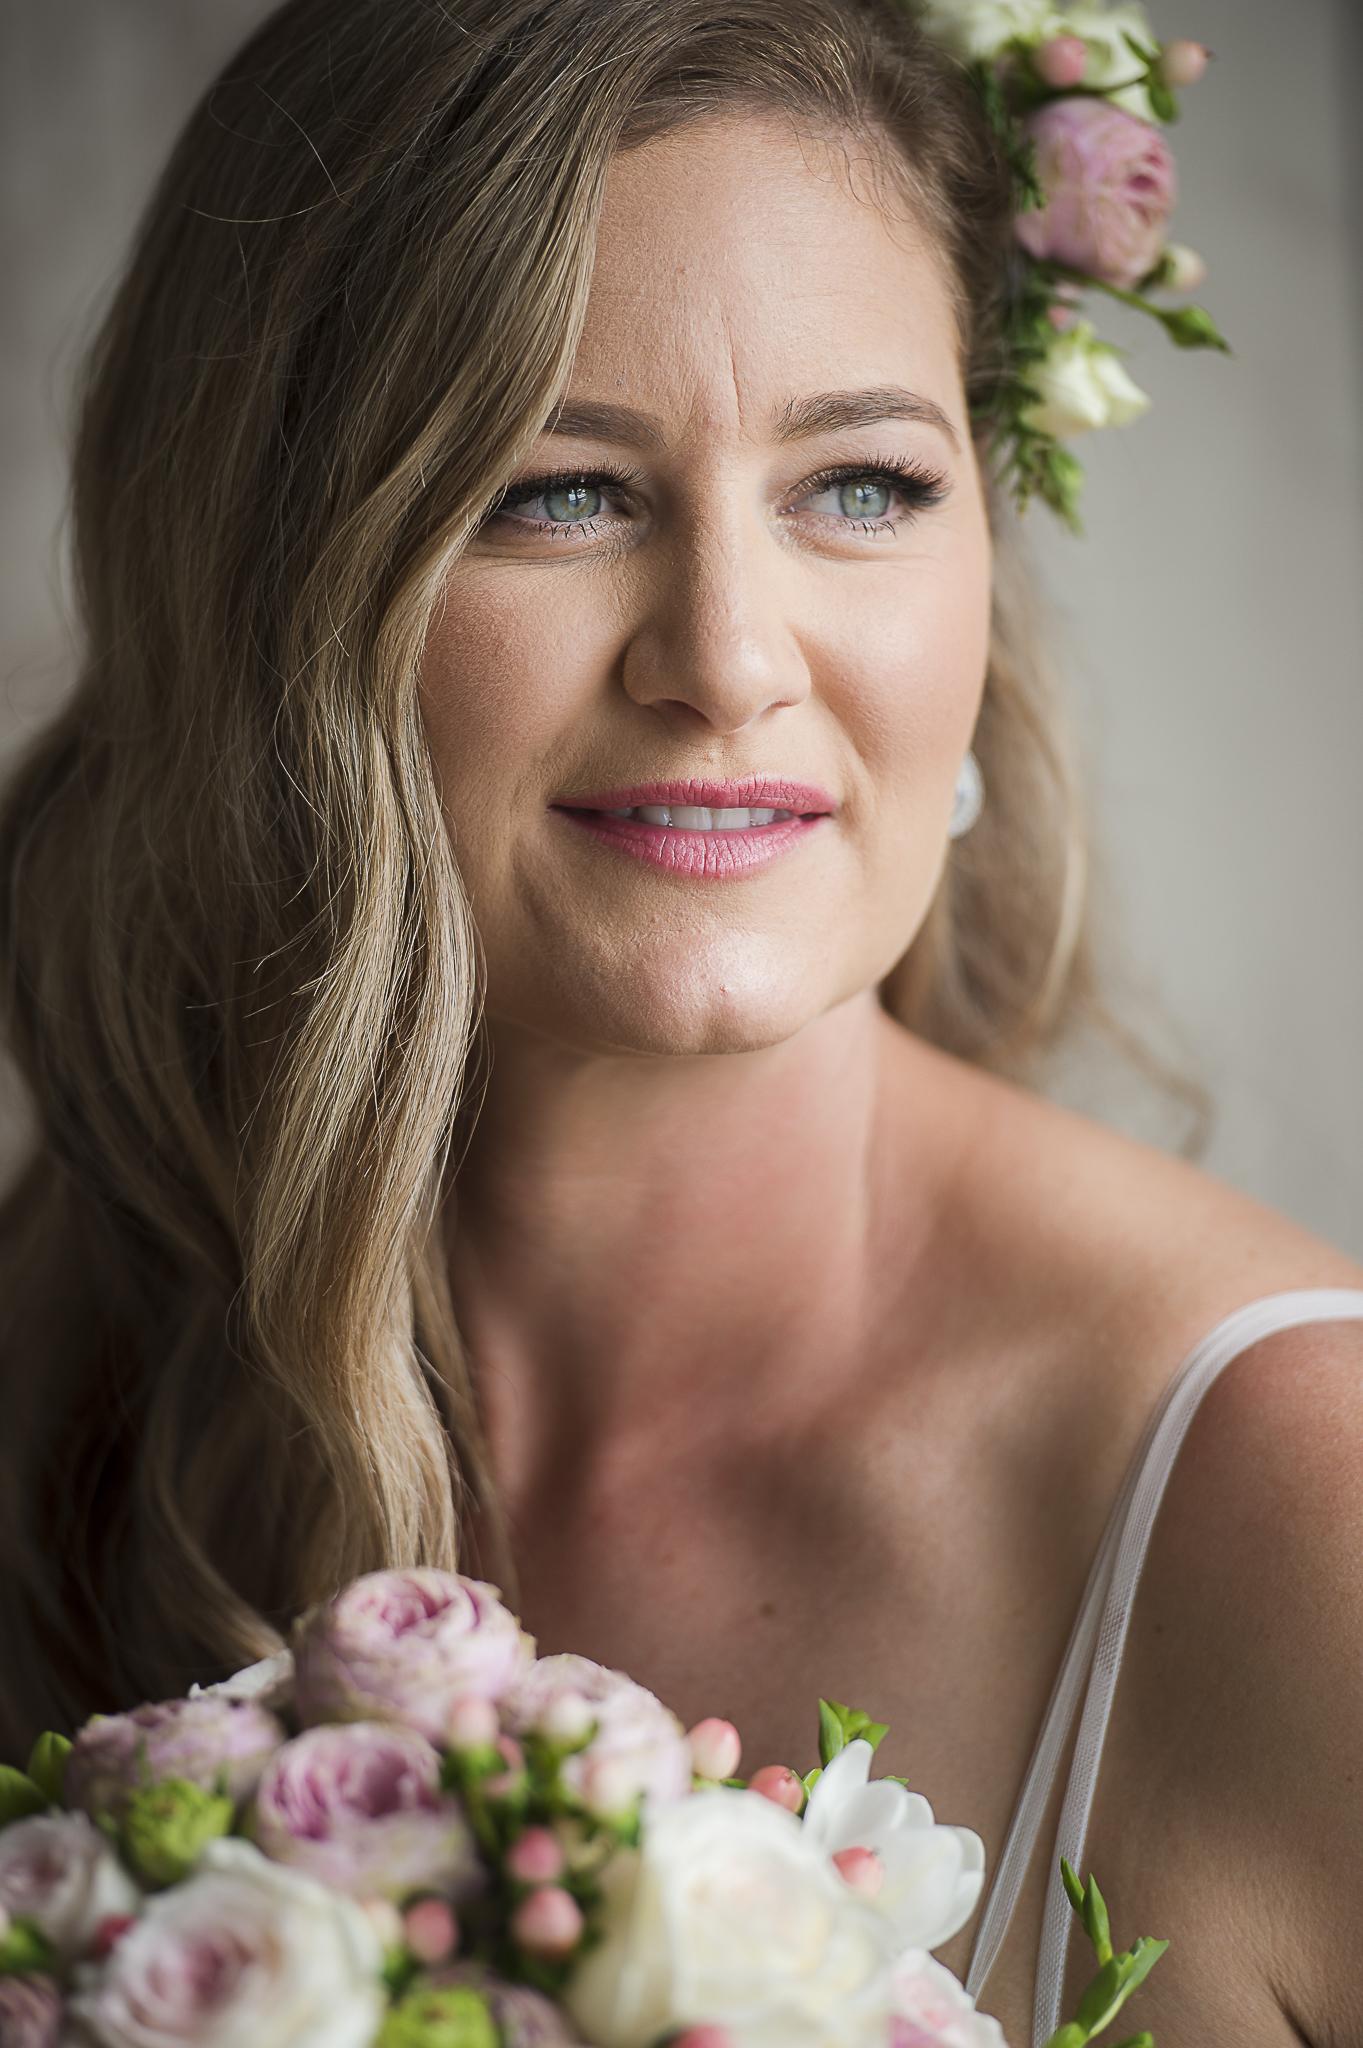 Portsea Bride